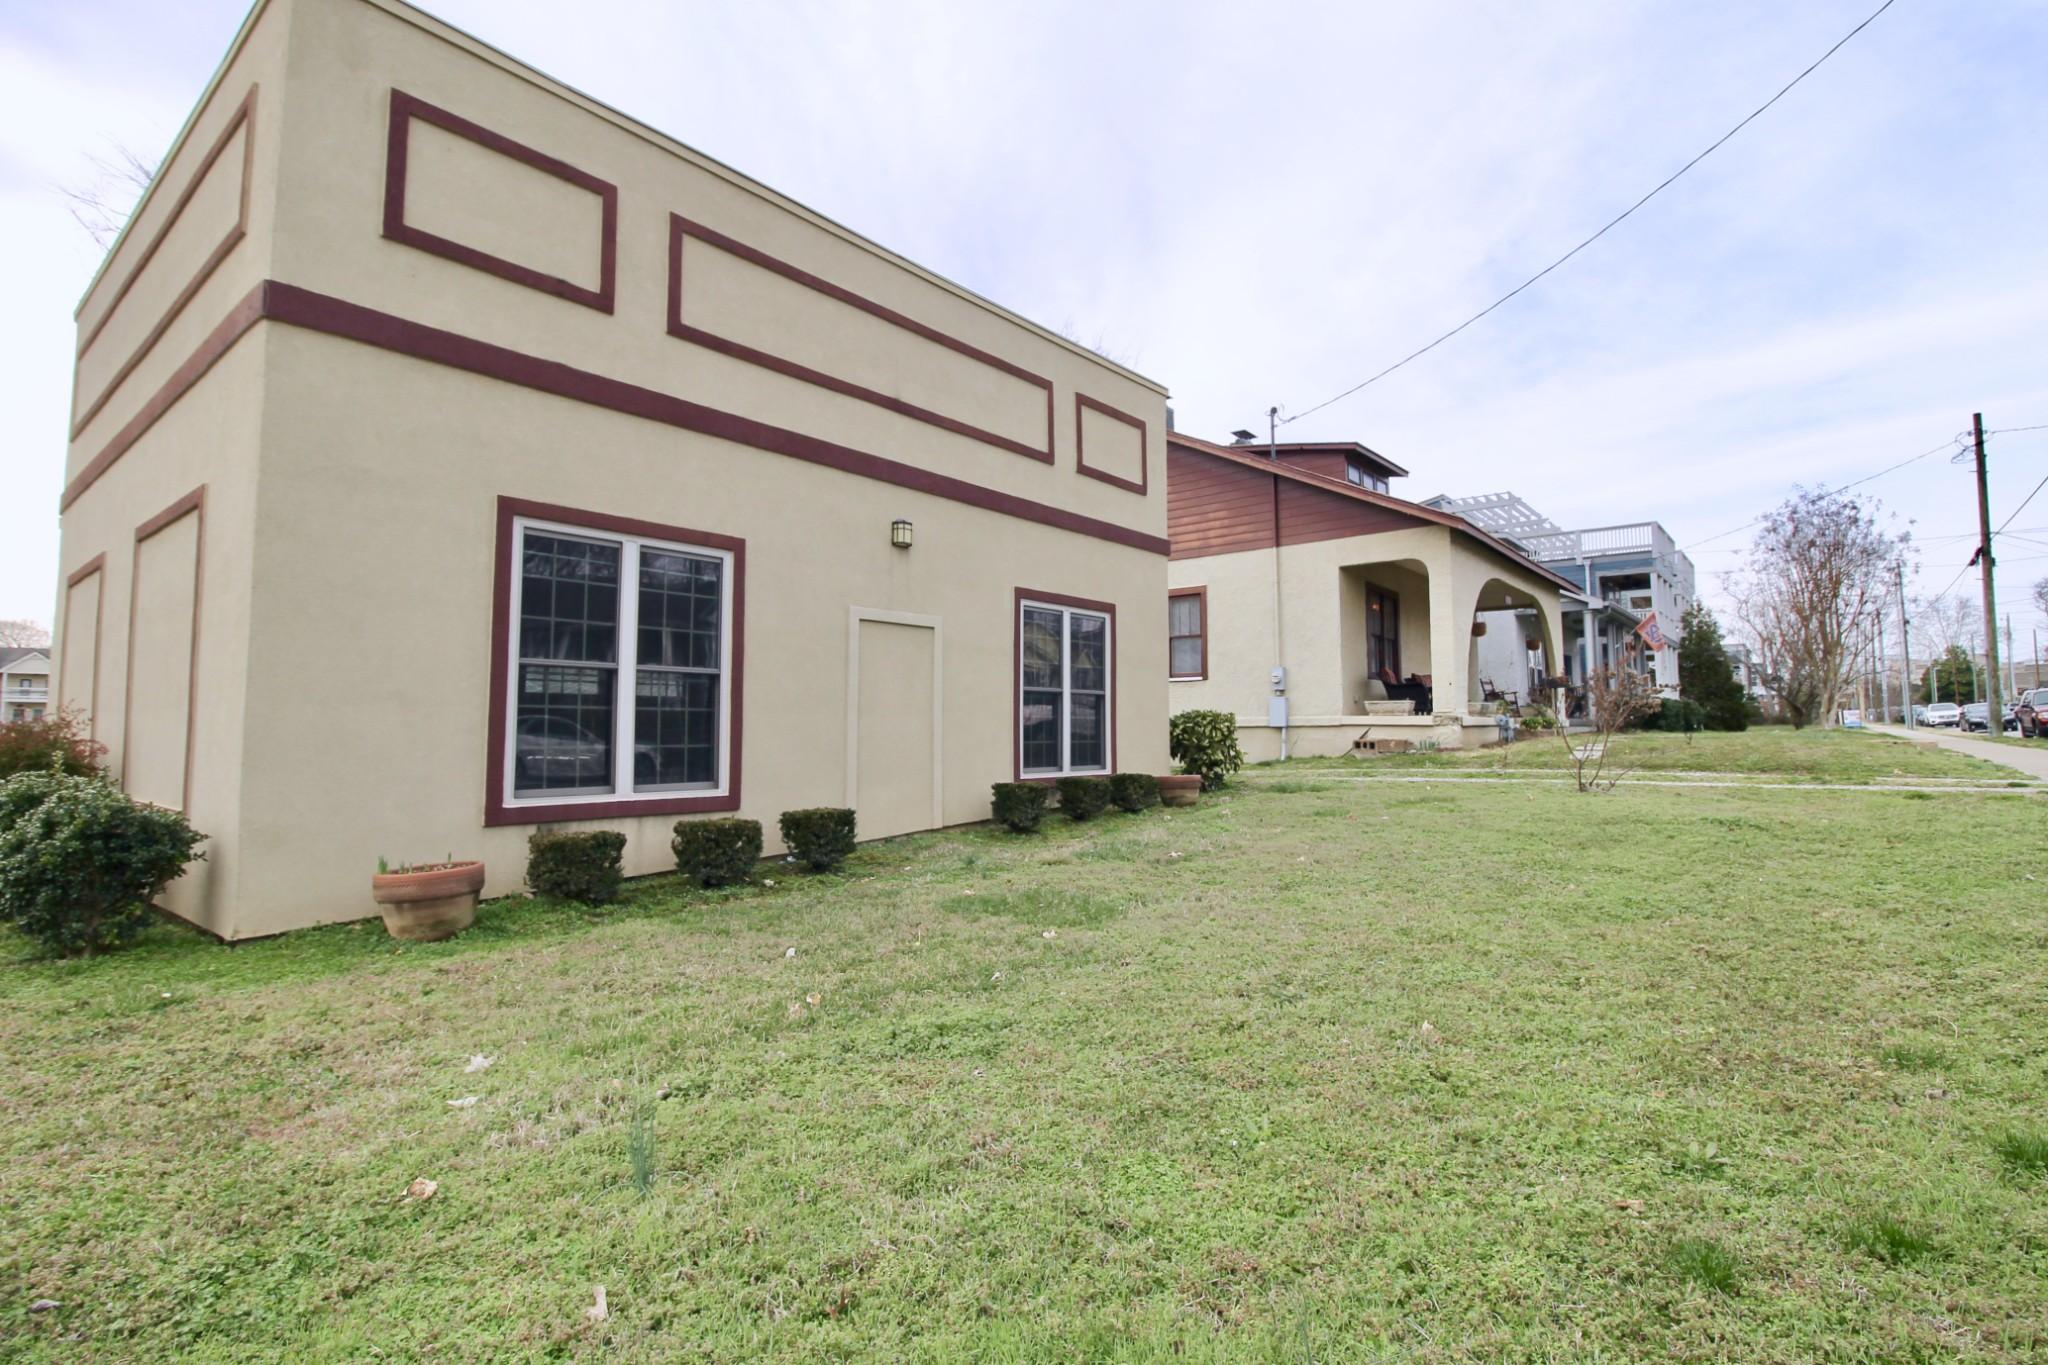 1803 5th AVE, N, Nashville, TN 37208 - Nashville, TN real estate listing